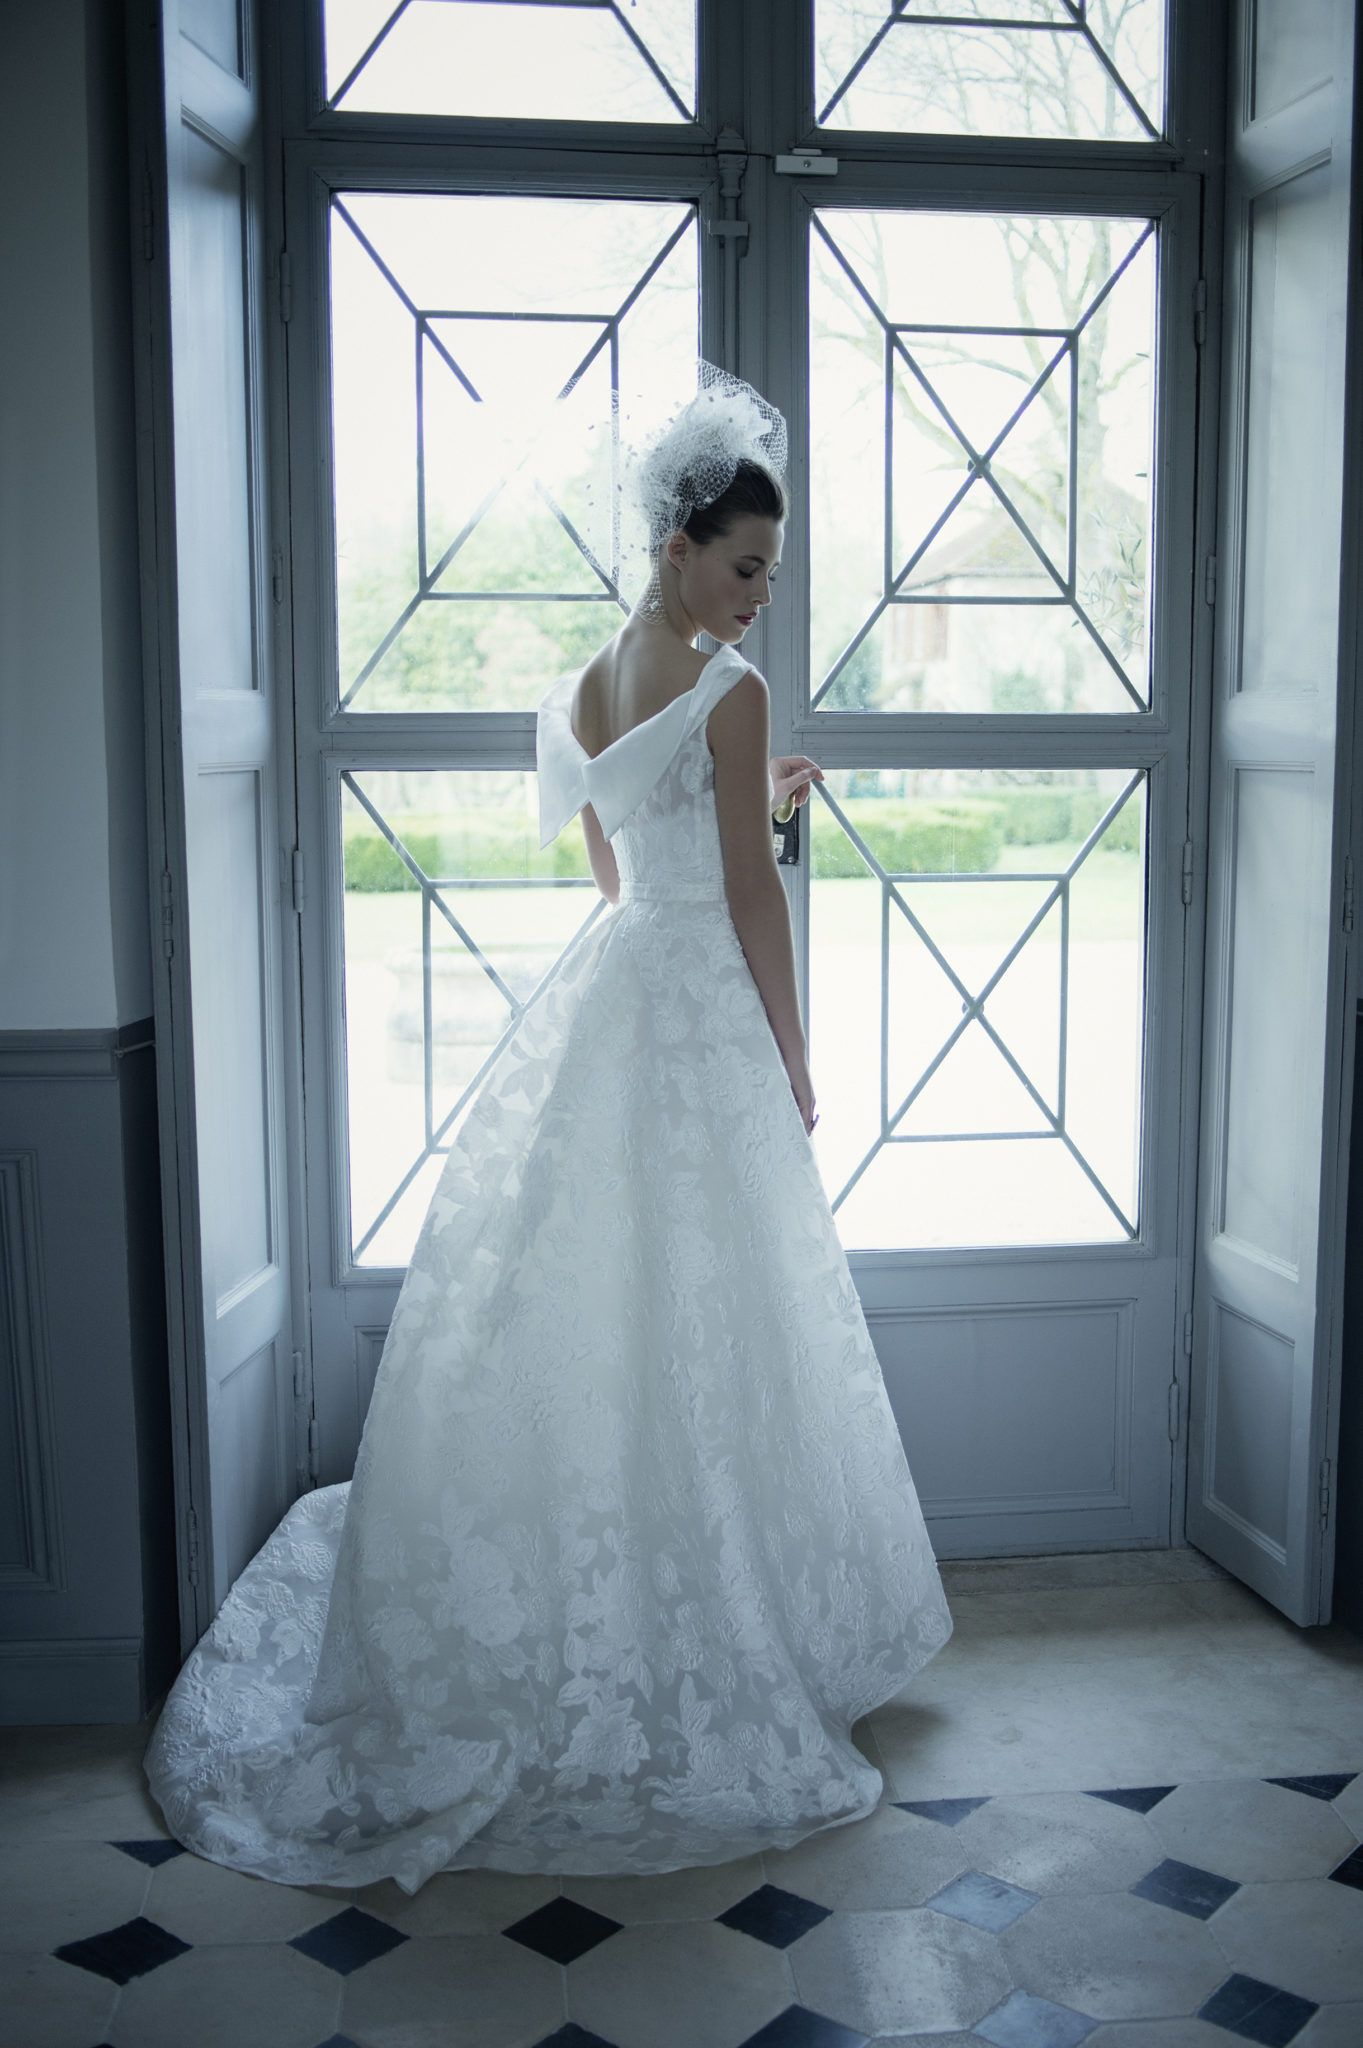 Robe Bach | Robe, Mariage and Wedding dress